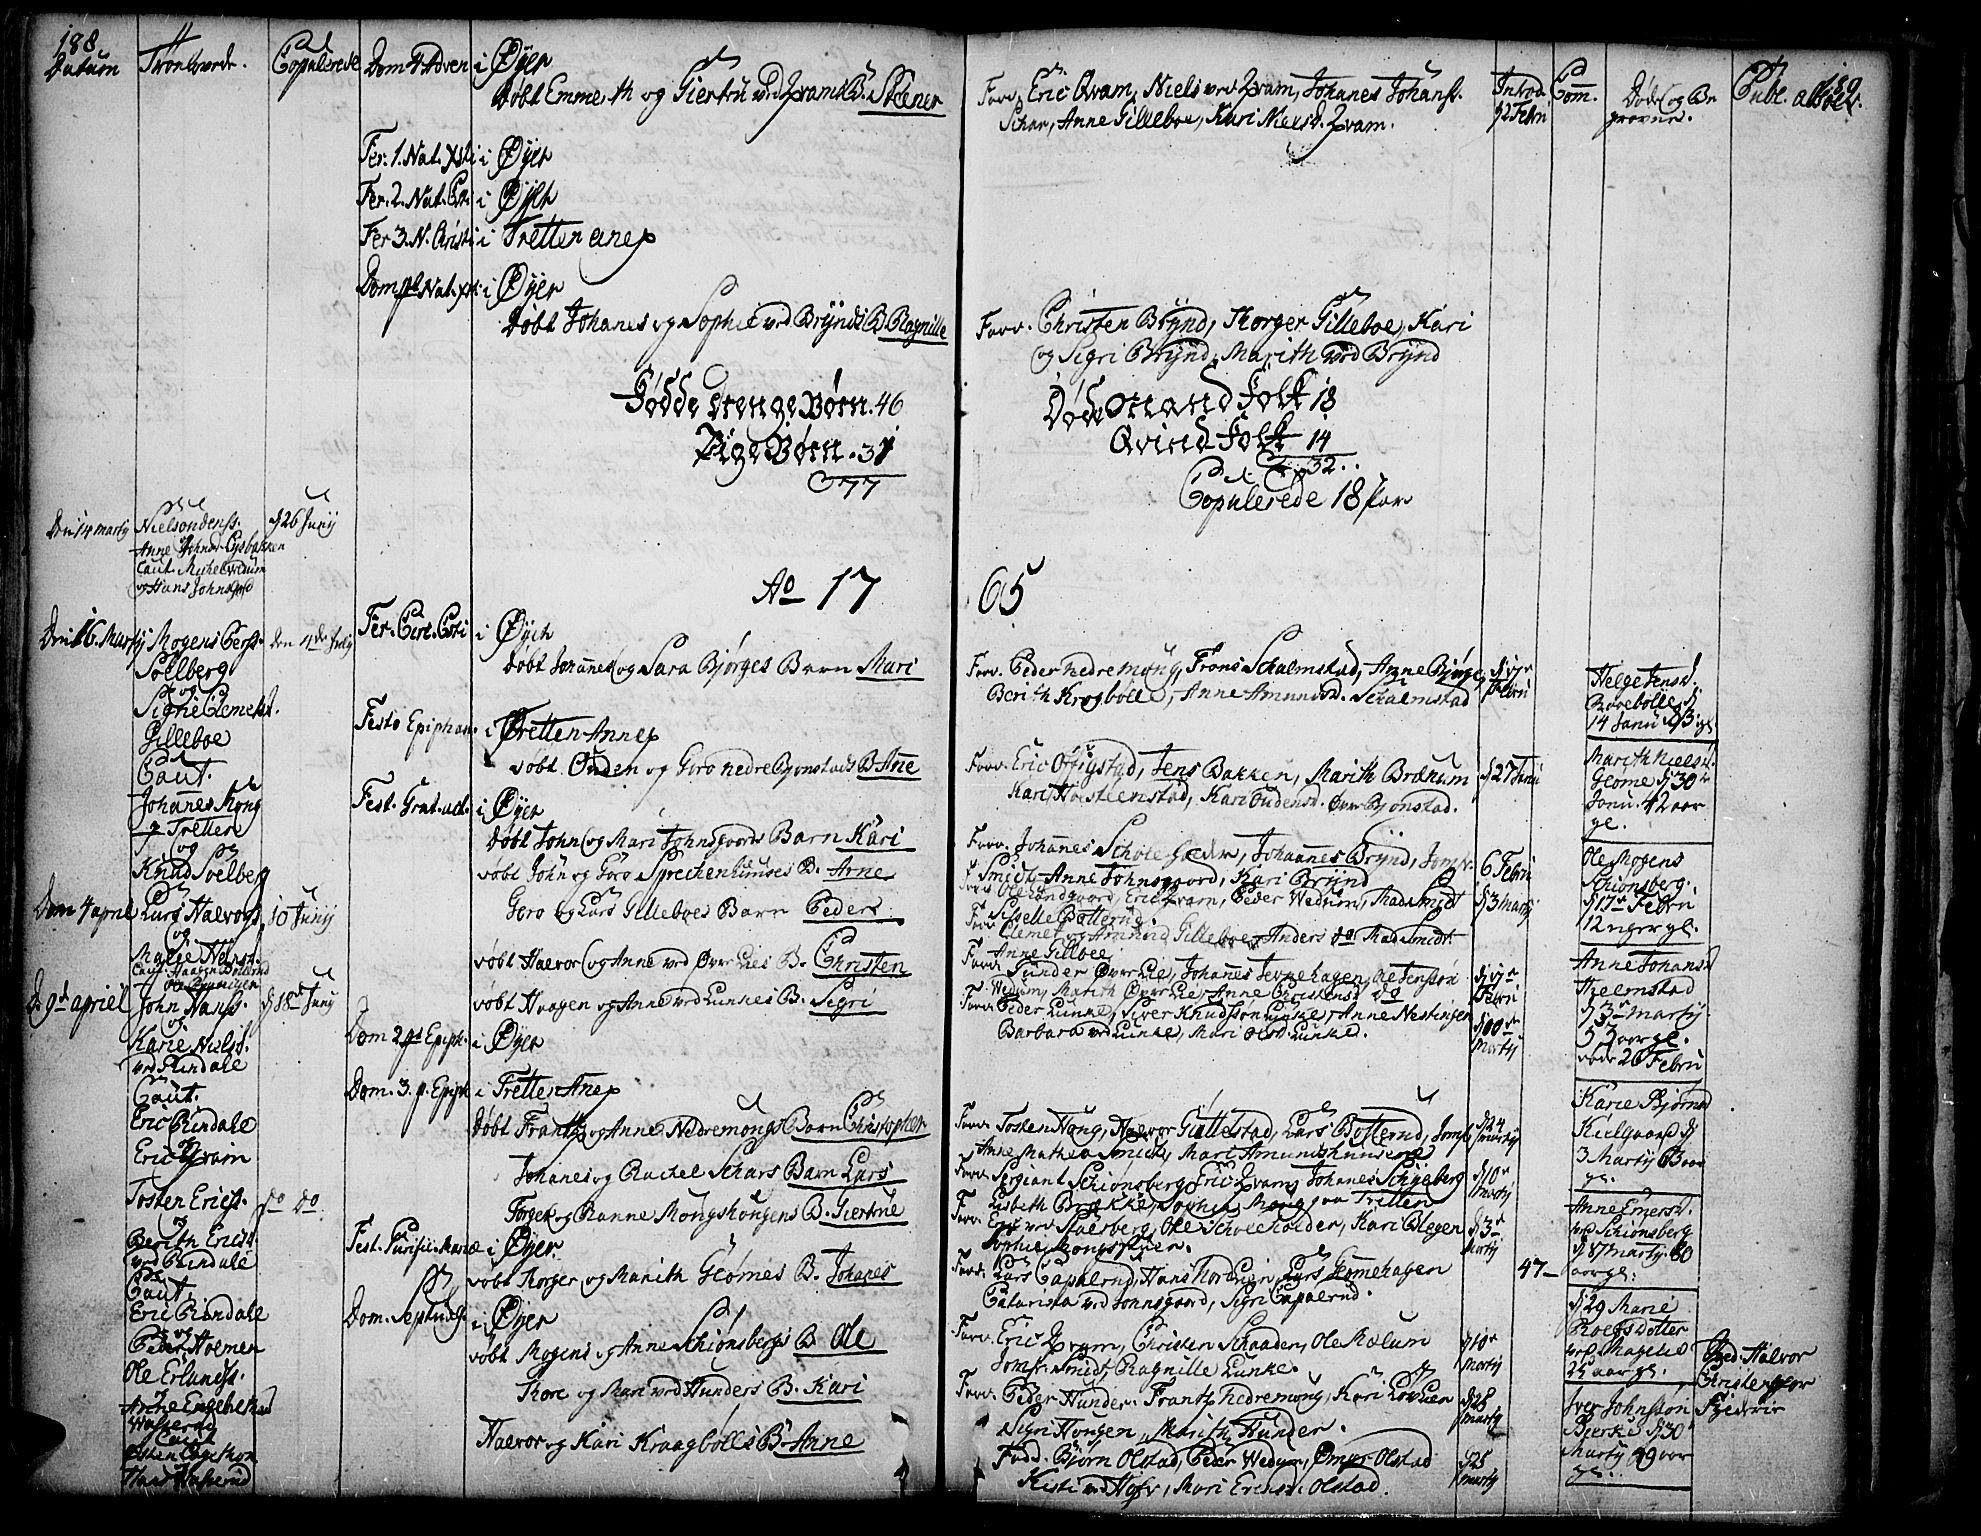 SAH, Øyer prestekontor, Ministerialbok nr. 2, 1733-1784, s. 188-189